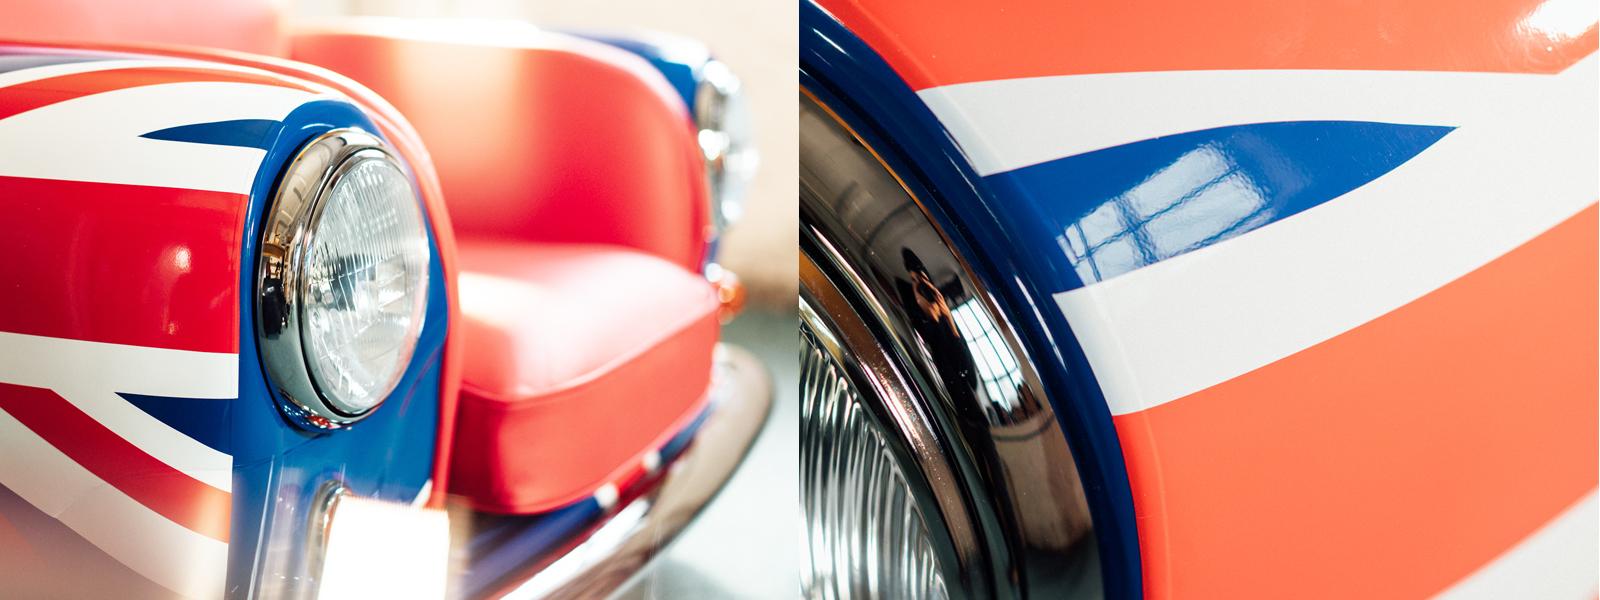 Cool Britannia - Union Jack Wrapped Mini Cooper Armchair - MiniRetro